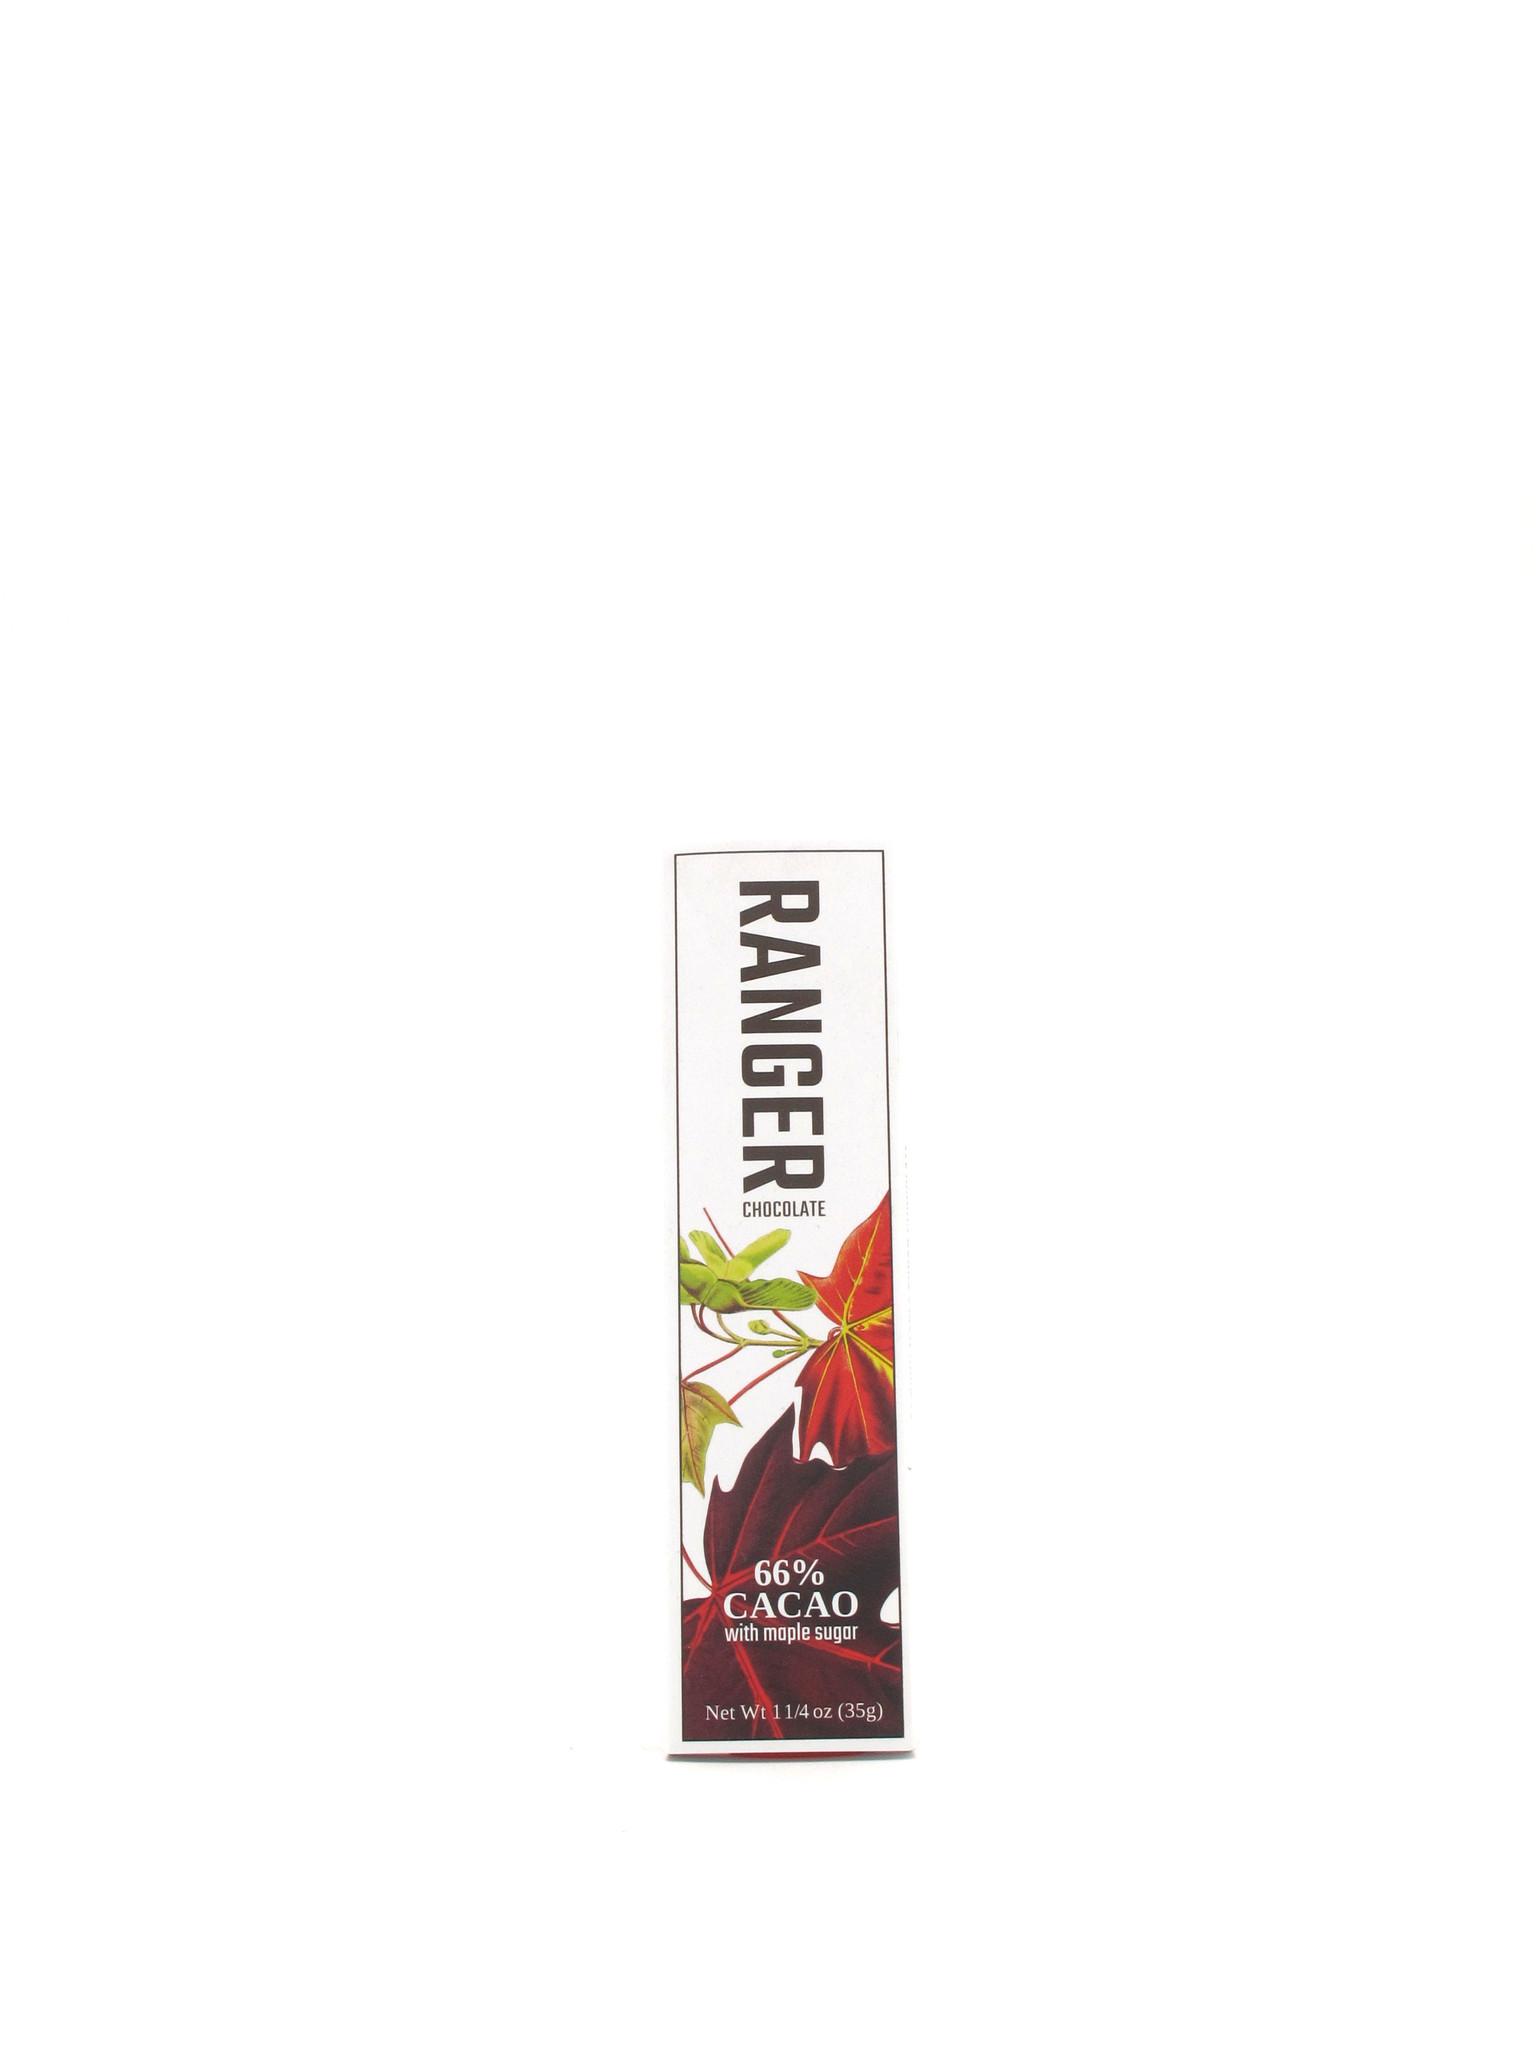 Ranger Chocolate Ranger Chocolate Maple Sugar 66% Chocolate Bar 1.25oz